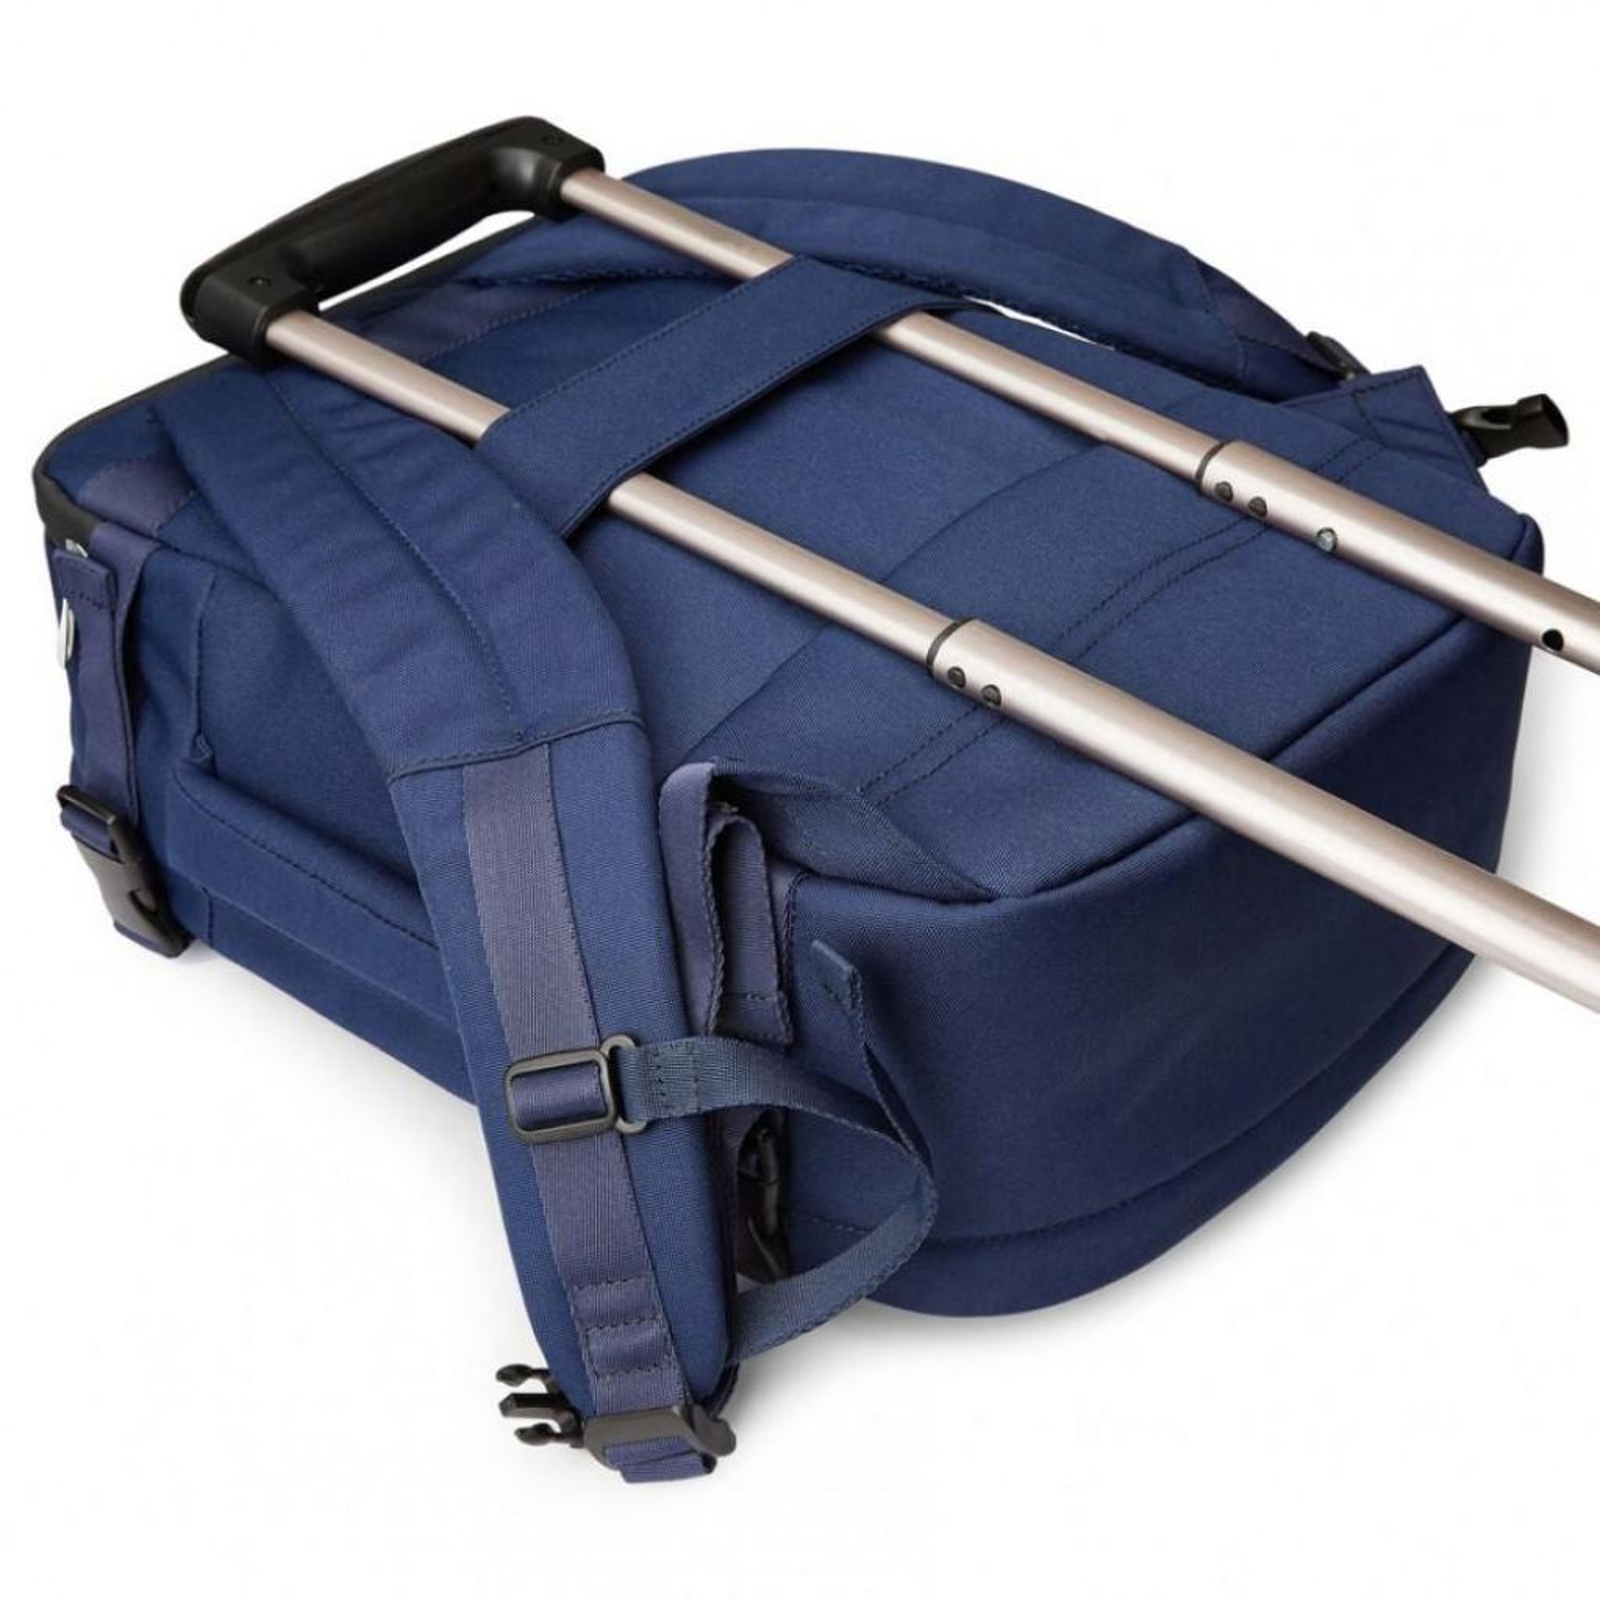 "Рюкзак для ноутбука Tucano 15.6"" TUGO' M CABIN blue (BKTUG-M-B) изображение 5"